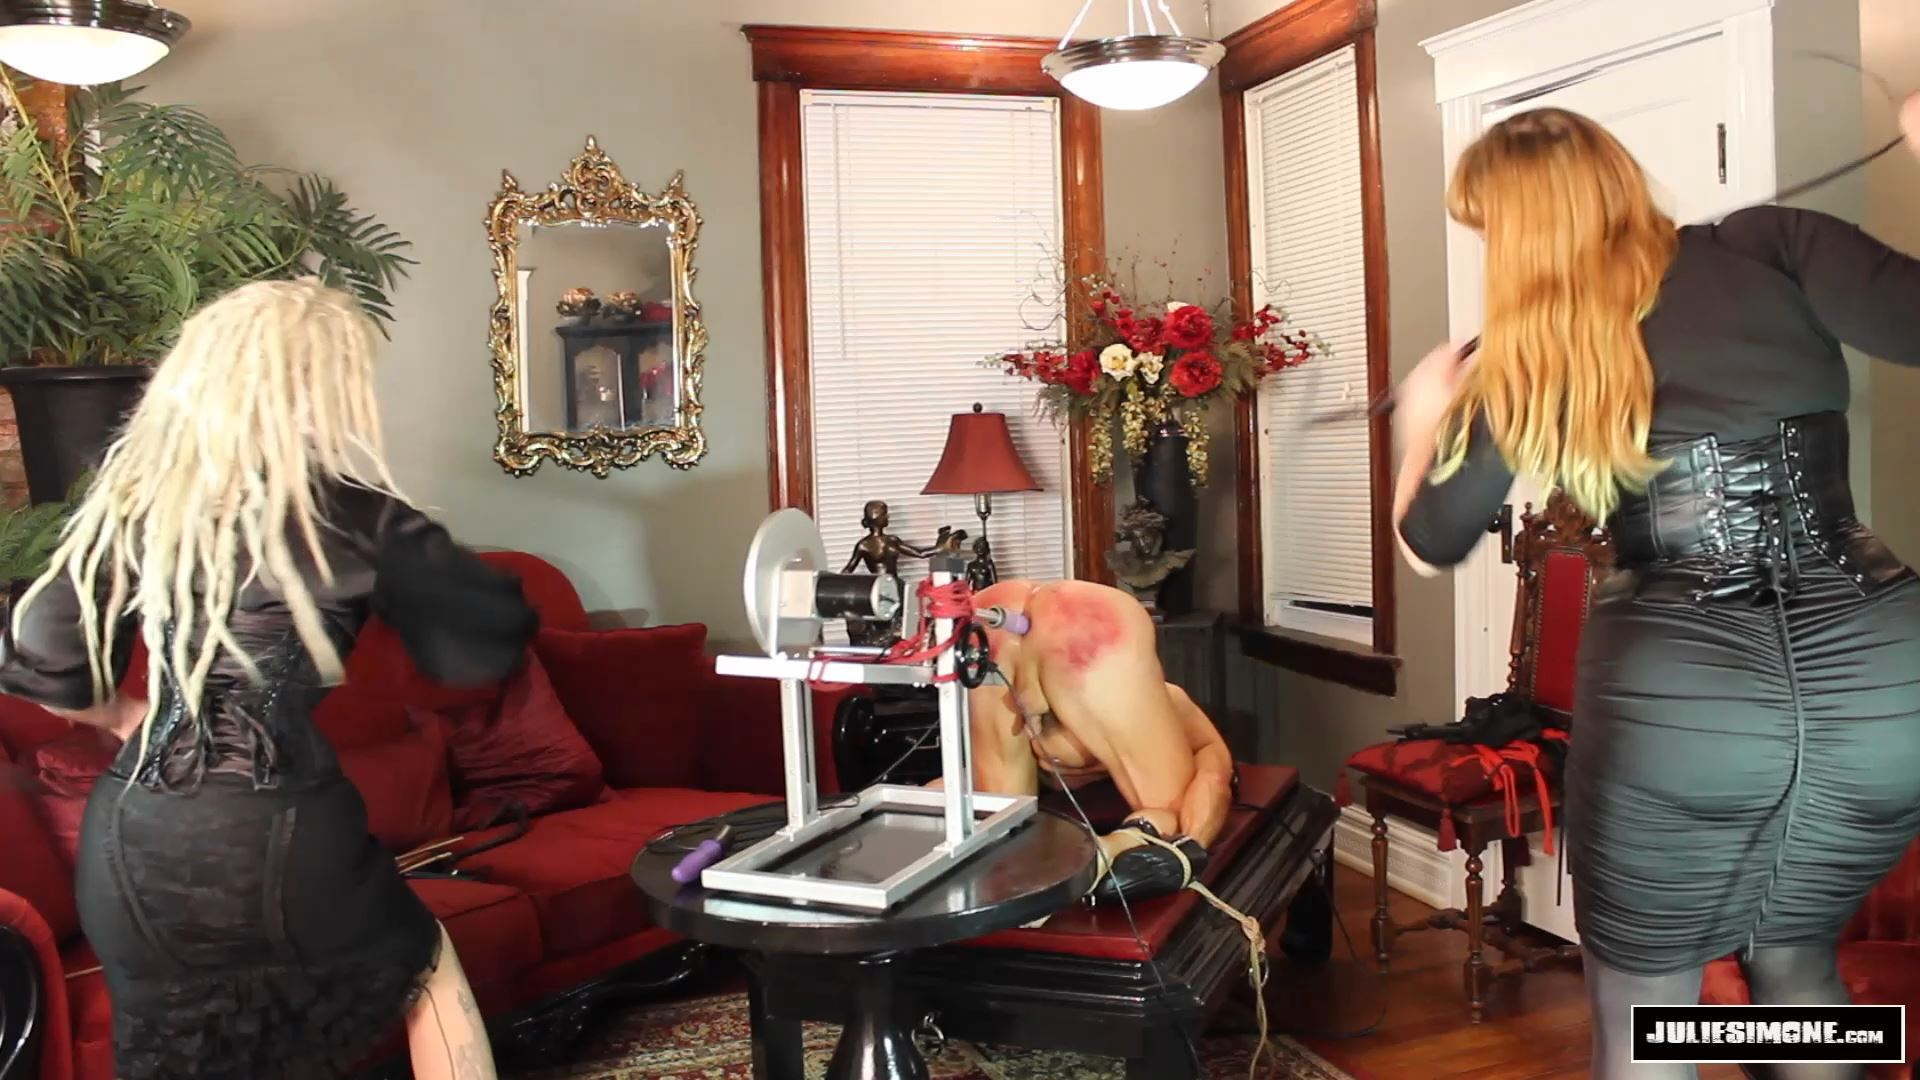 Devlynn DeSade, Julie Simone In Scene: Fucking Machine Whipping - JULIESIMONE - FULL HD/1080p/MP4